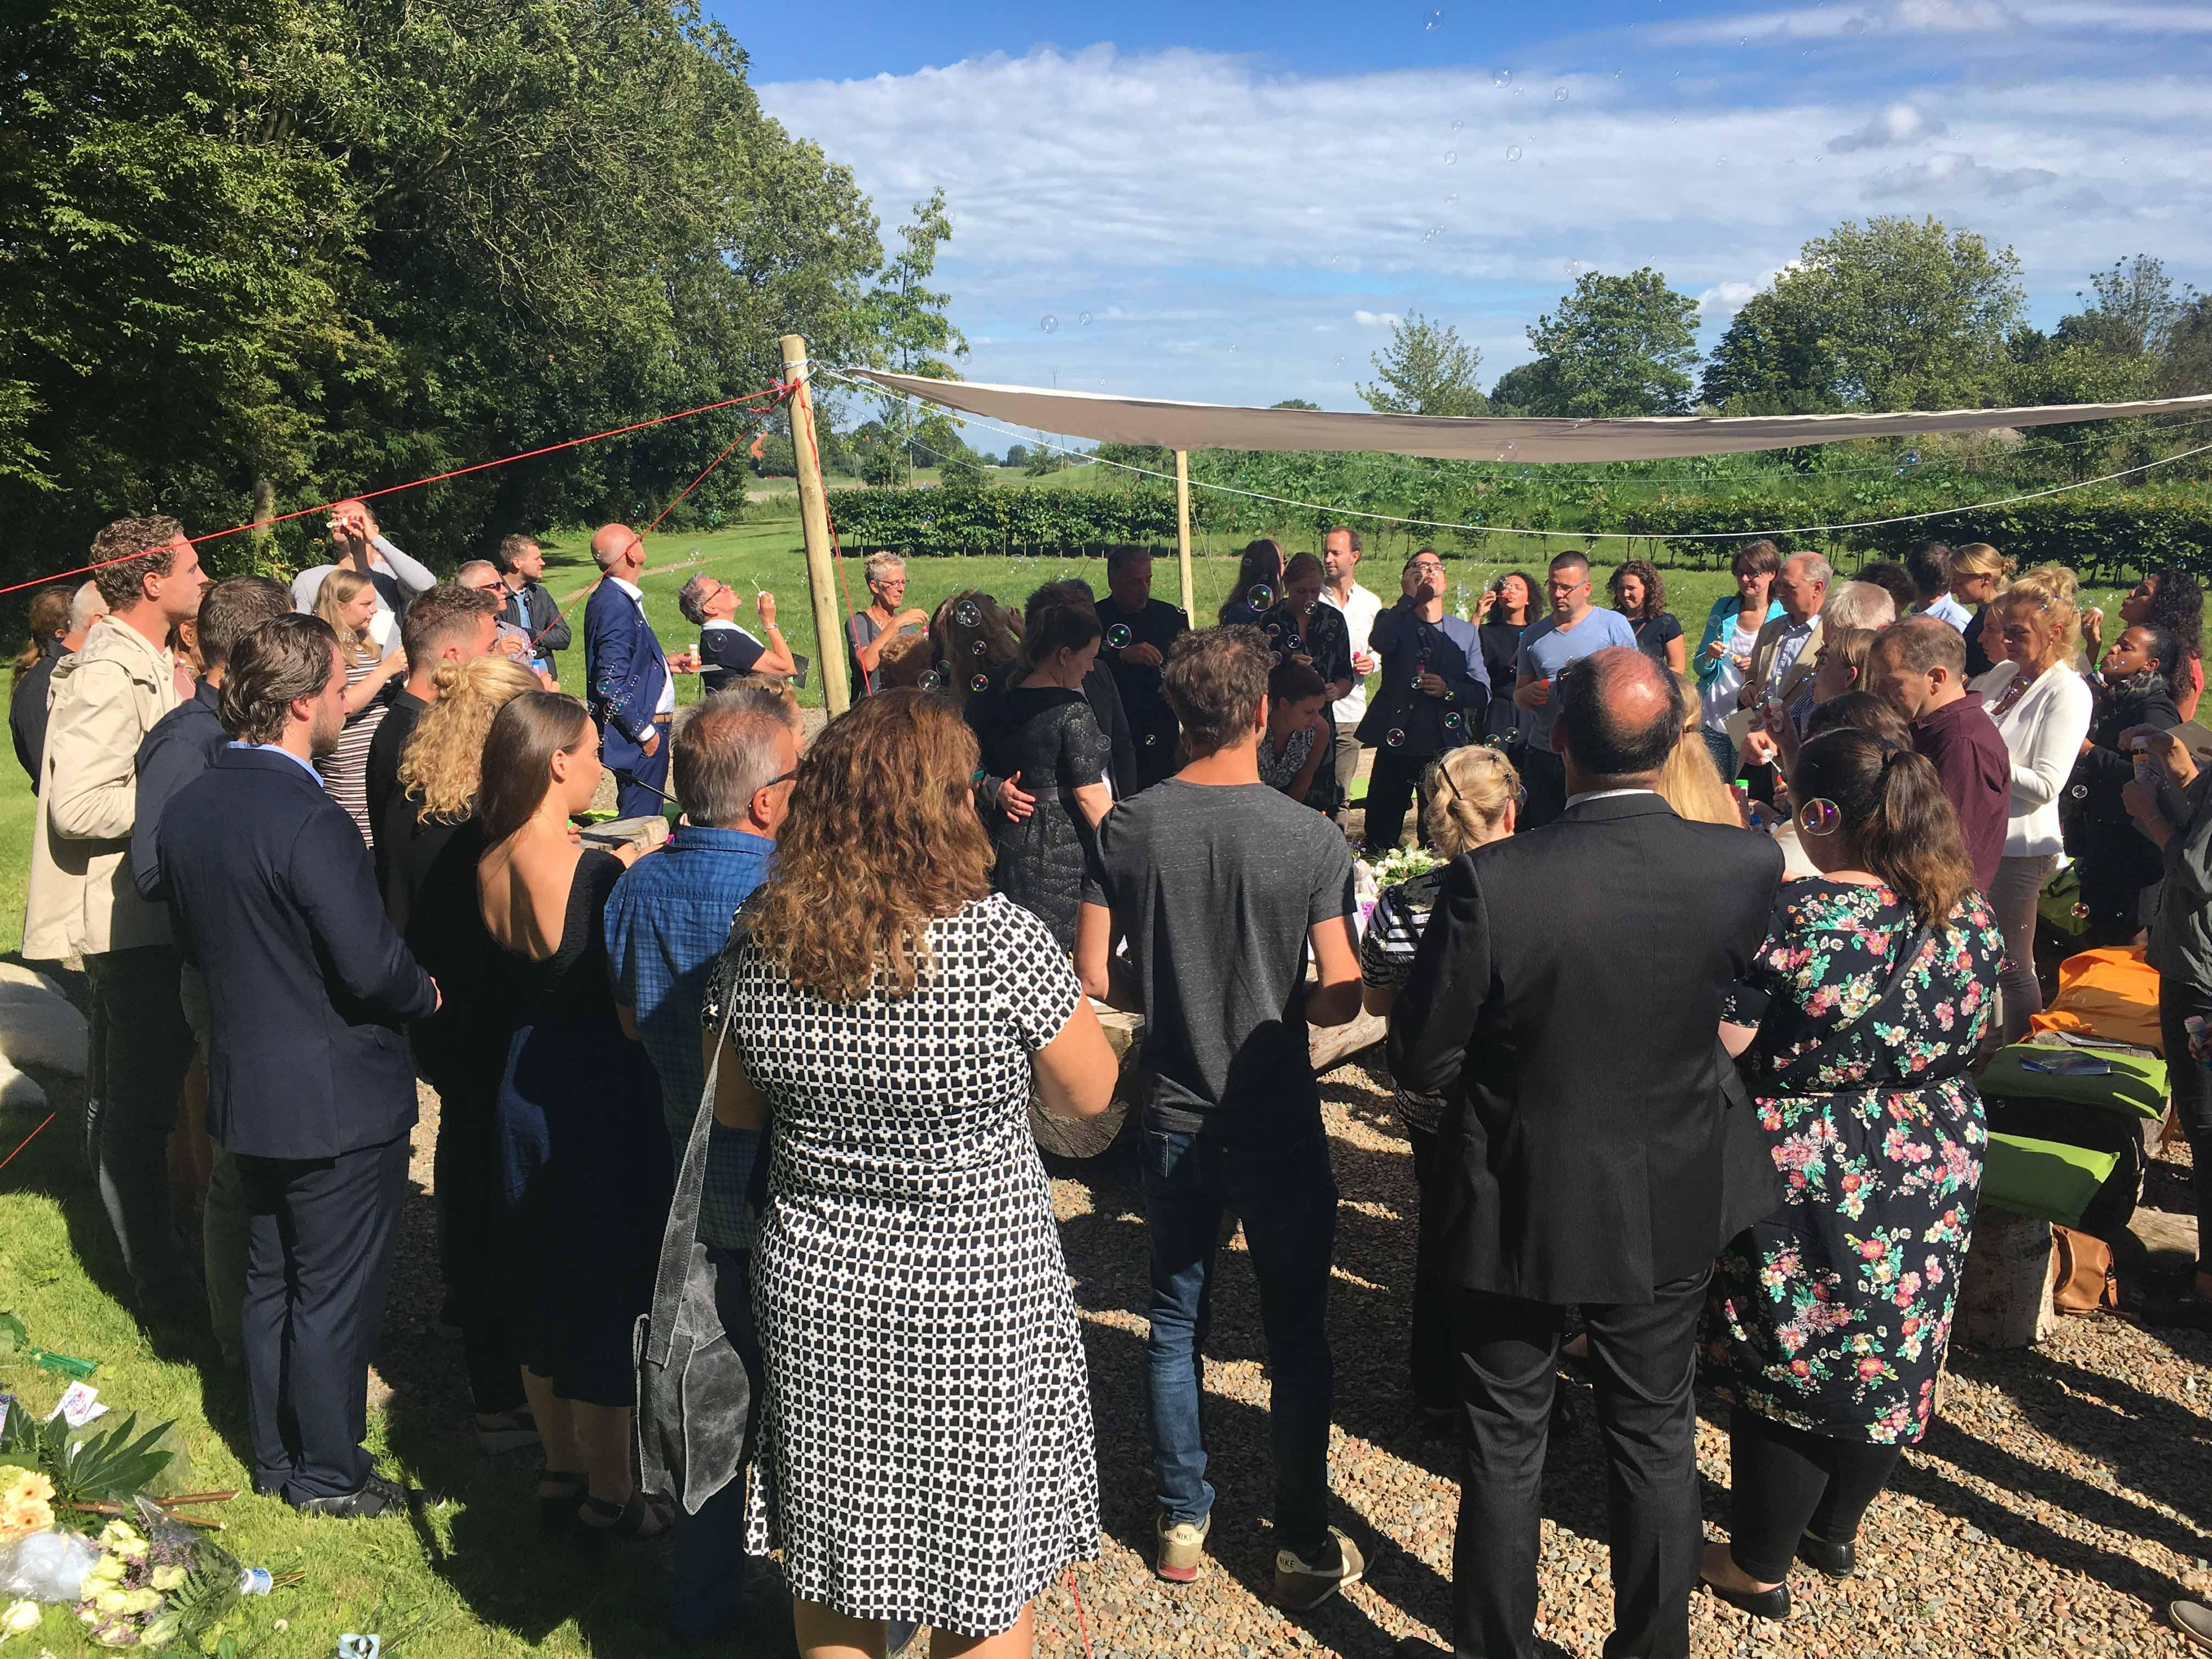 Afscheidsviering Crematorium Heerhugowaard